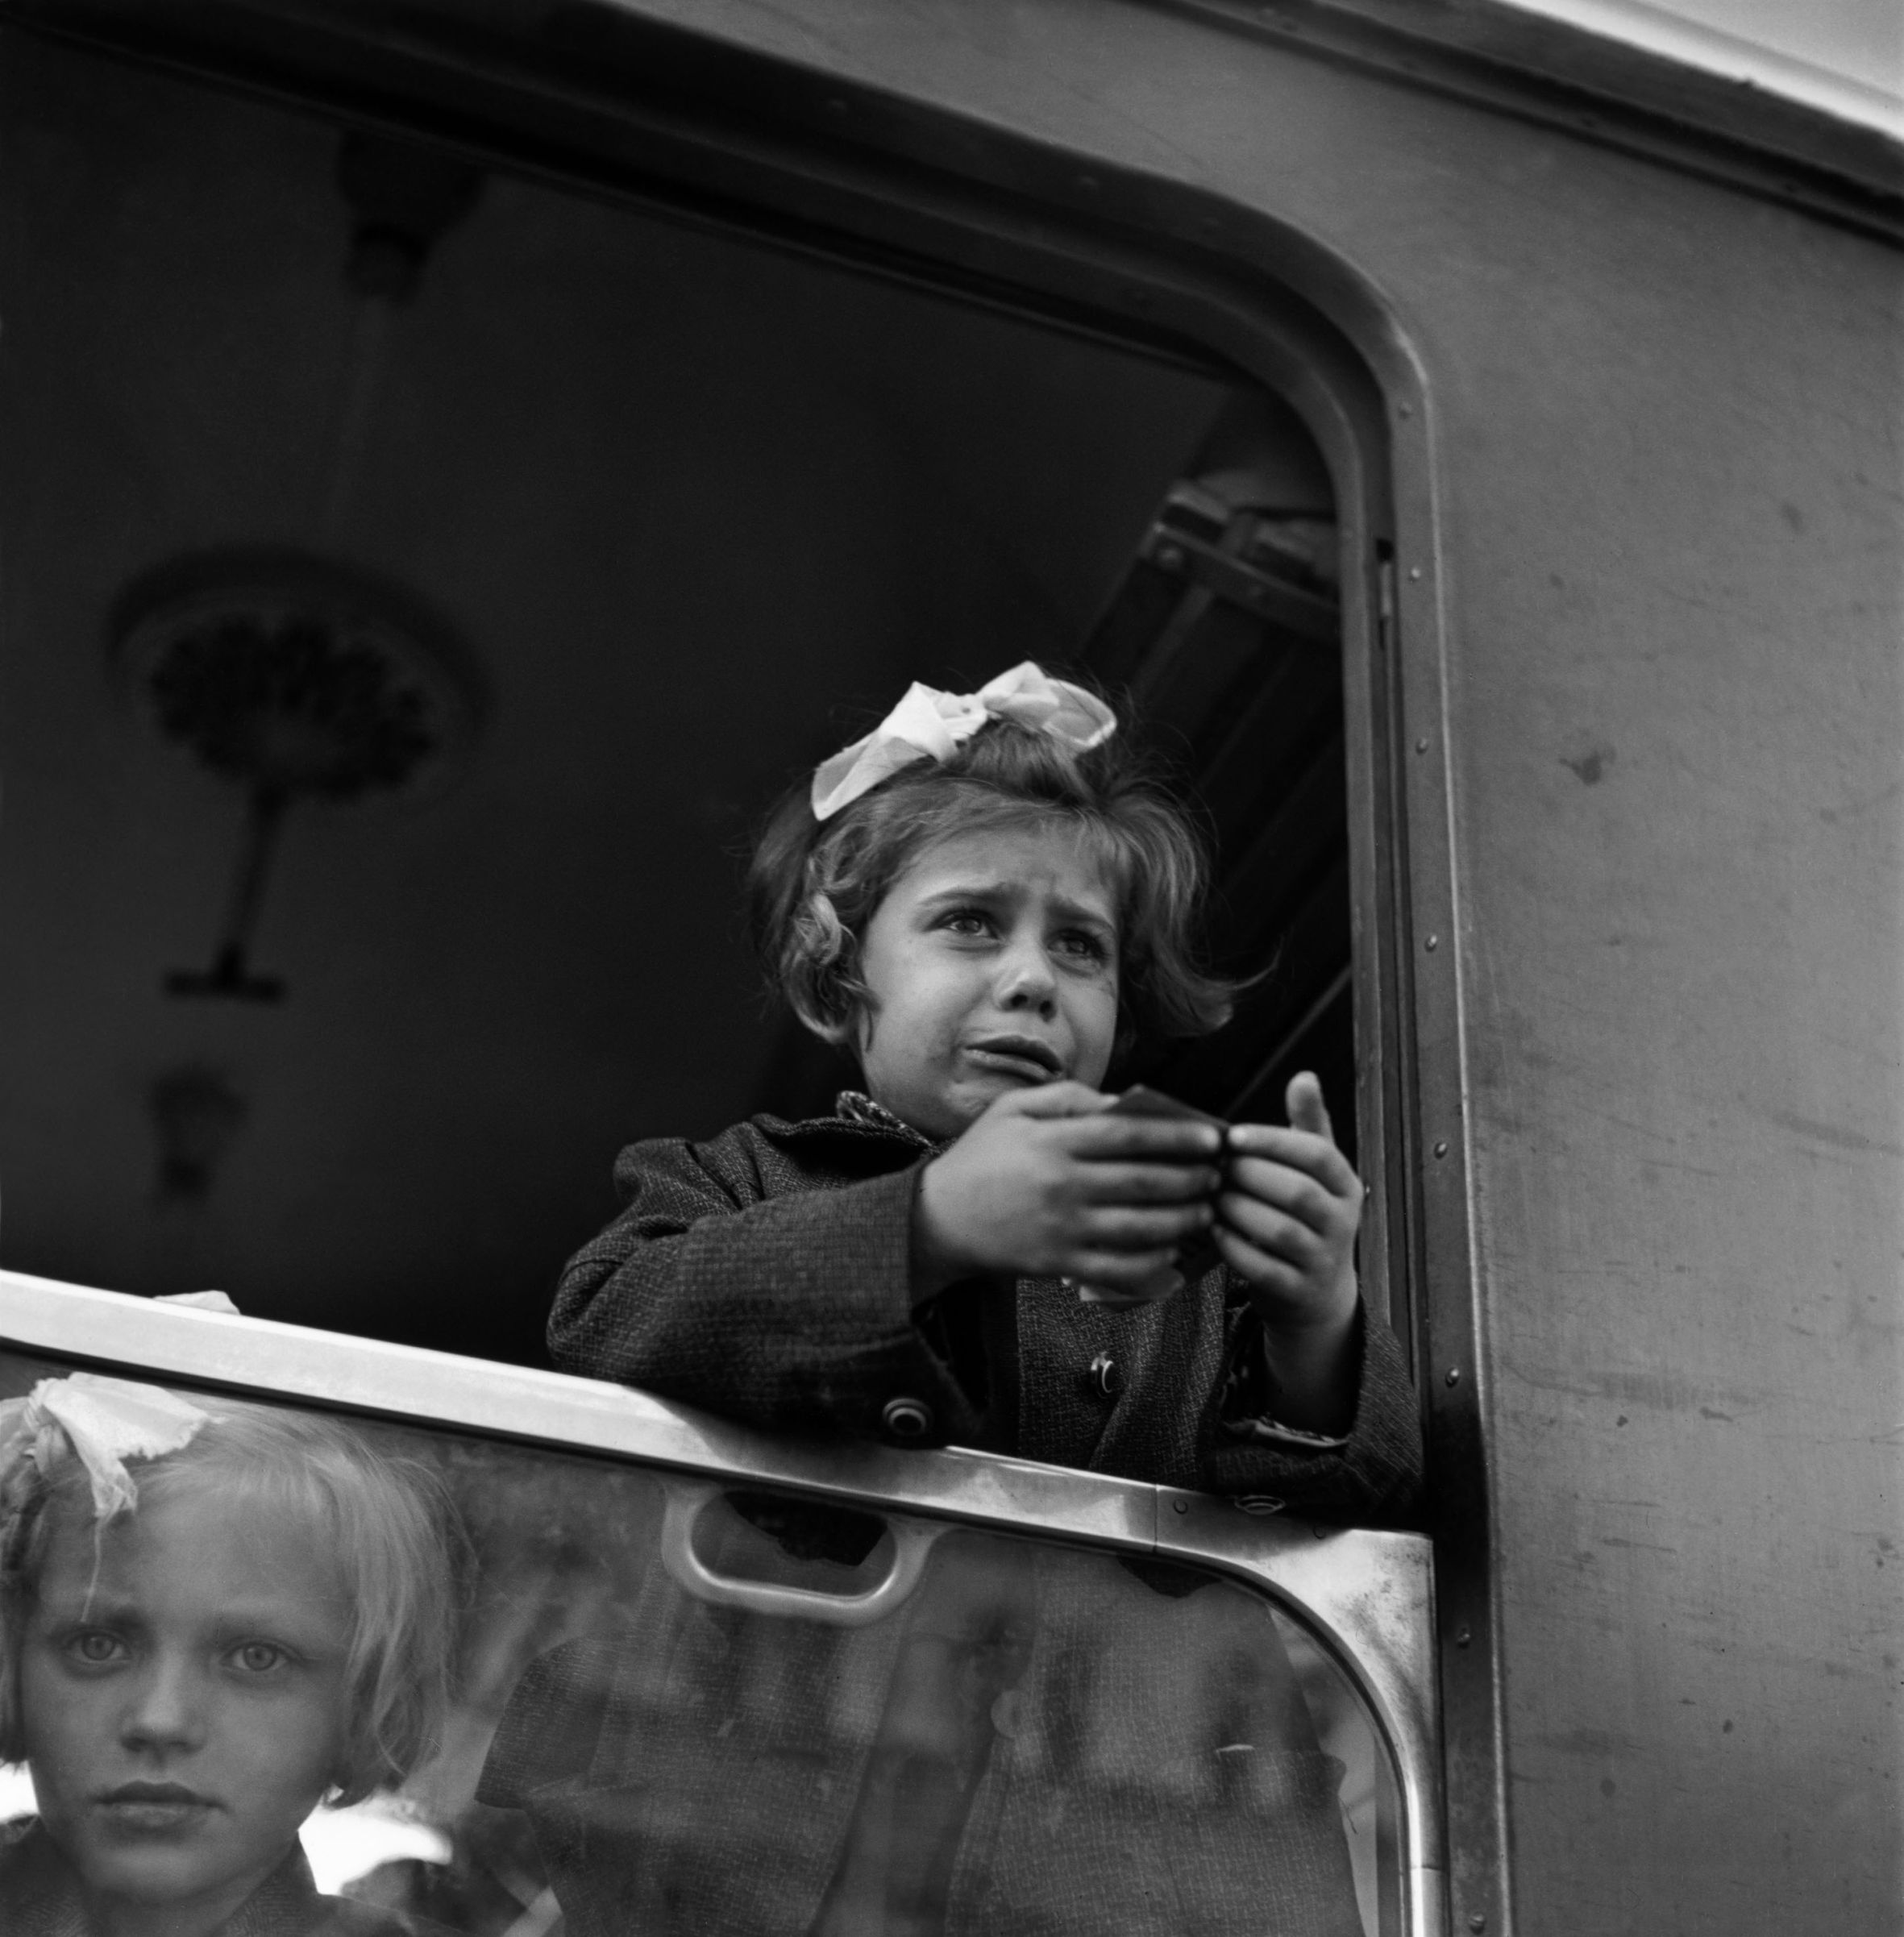 Hungary. Budapest. 1947 © Werner Bischof_ Magnum Photos 2019